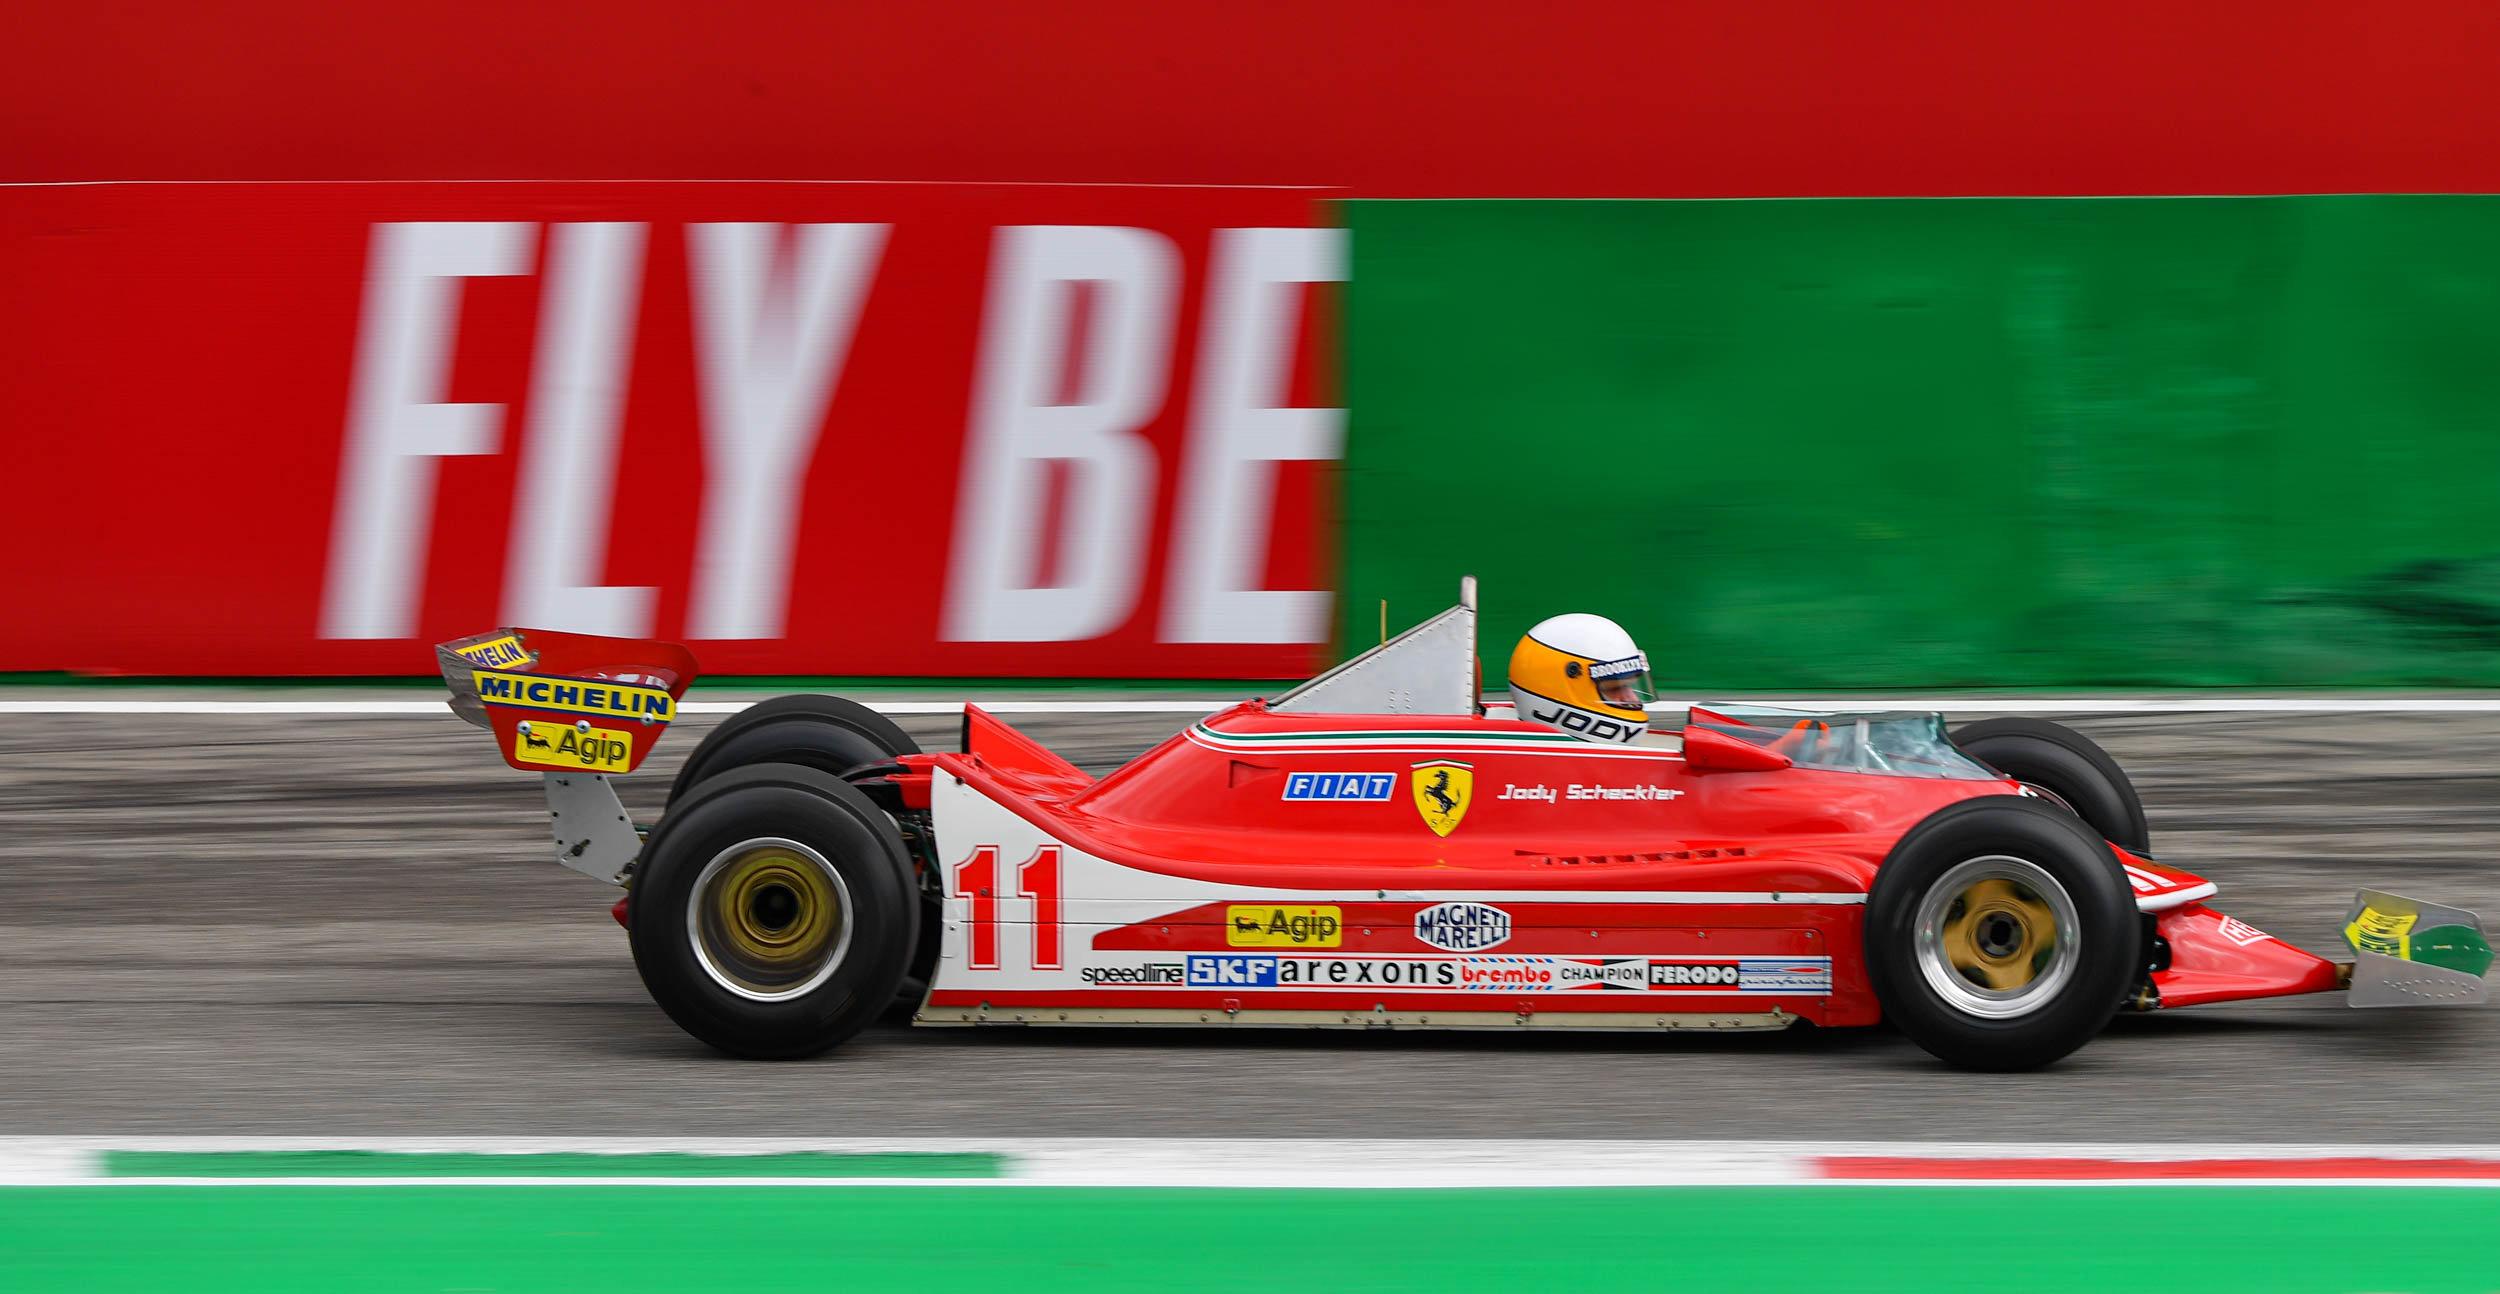 Jody Scheckter sulla Ferrari 312T4 del 1979